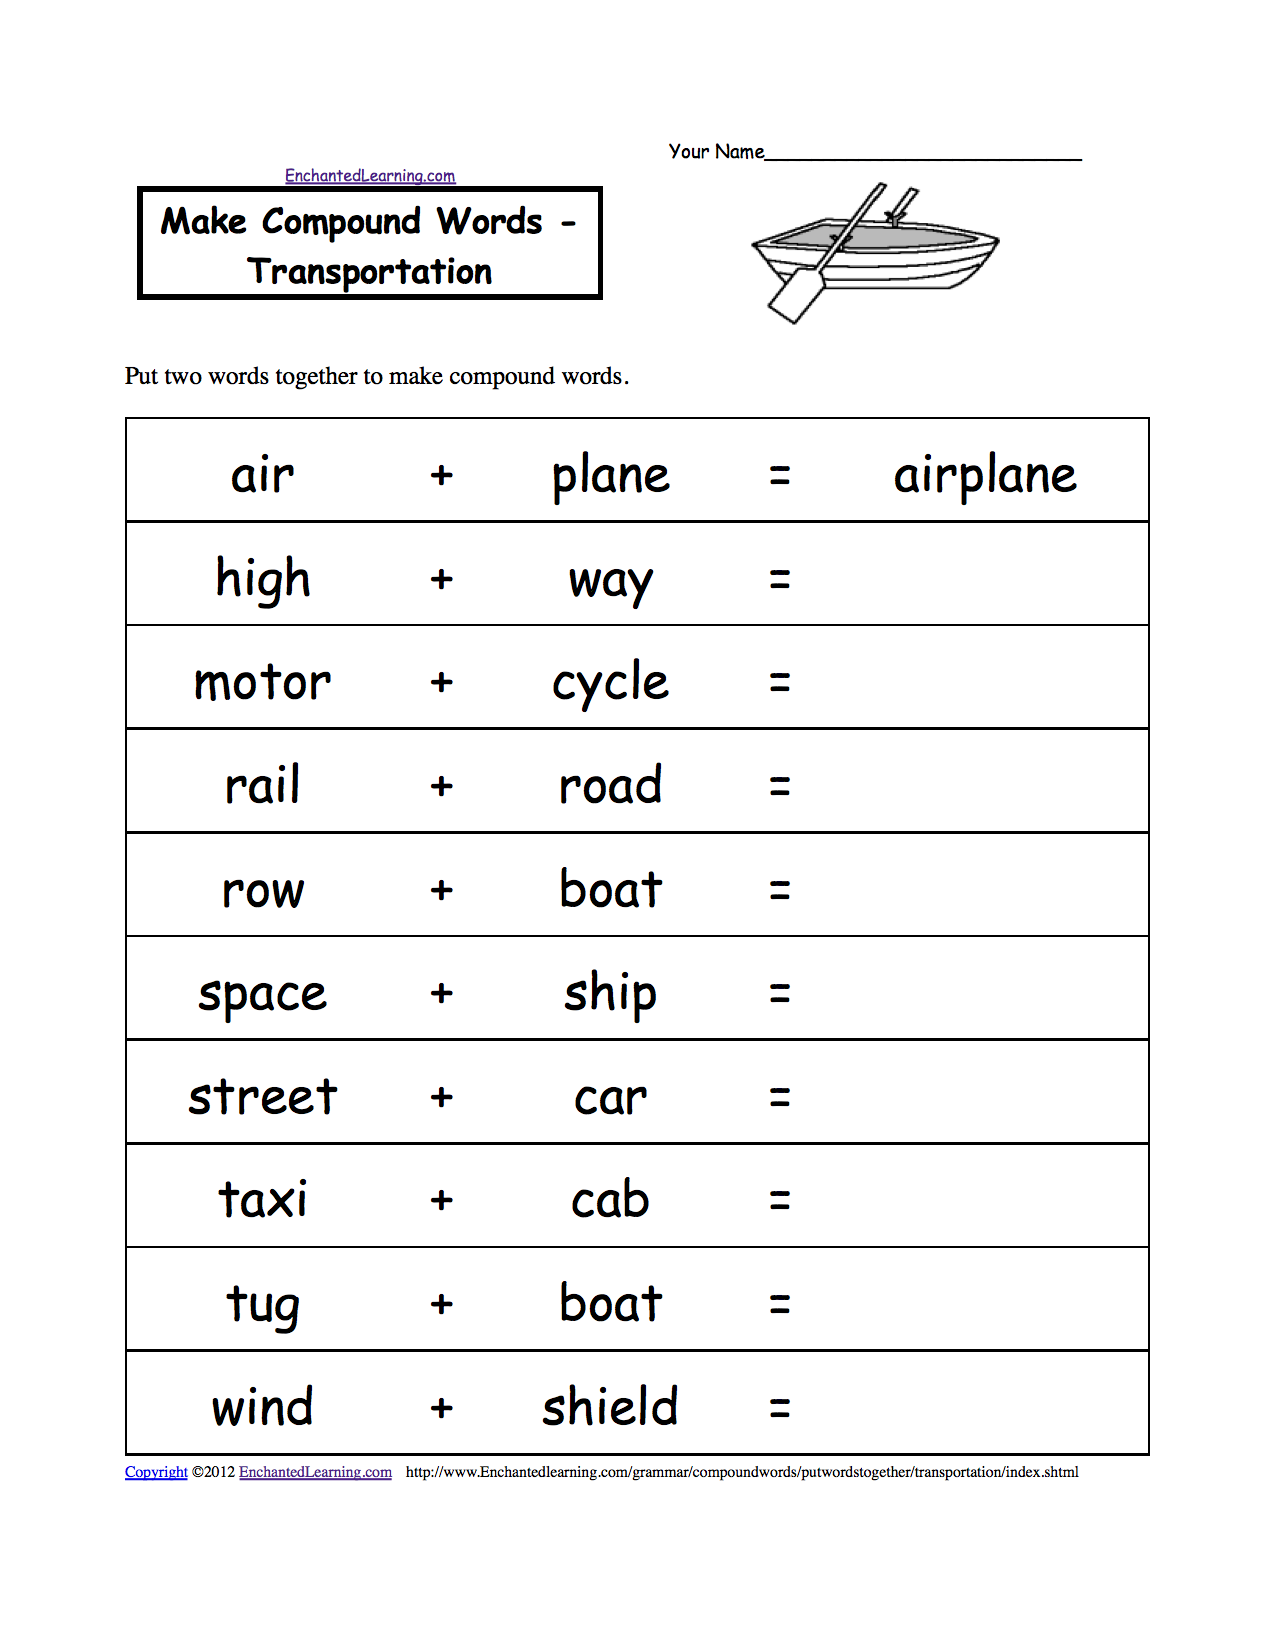 Make Compound Words, Printable Worksheets. EnchantedLearning.com